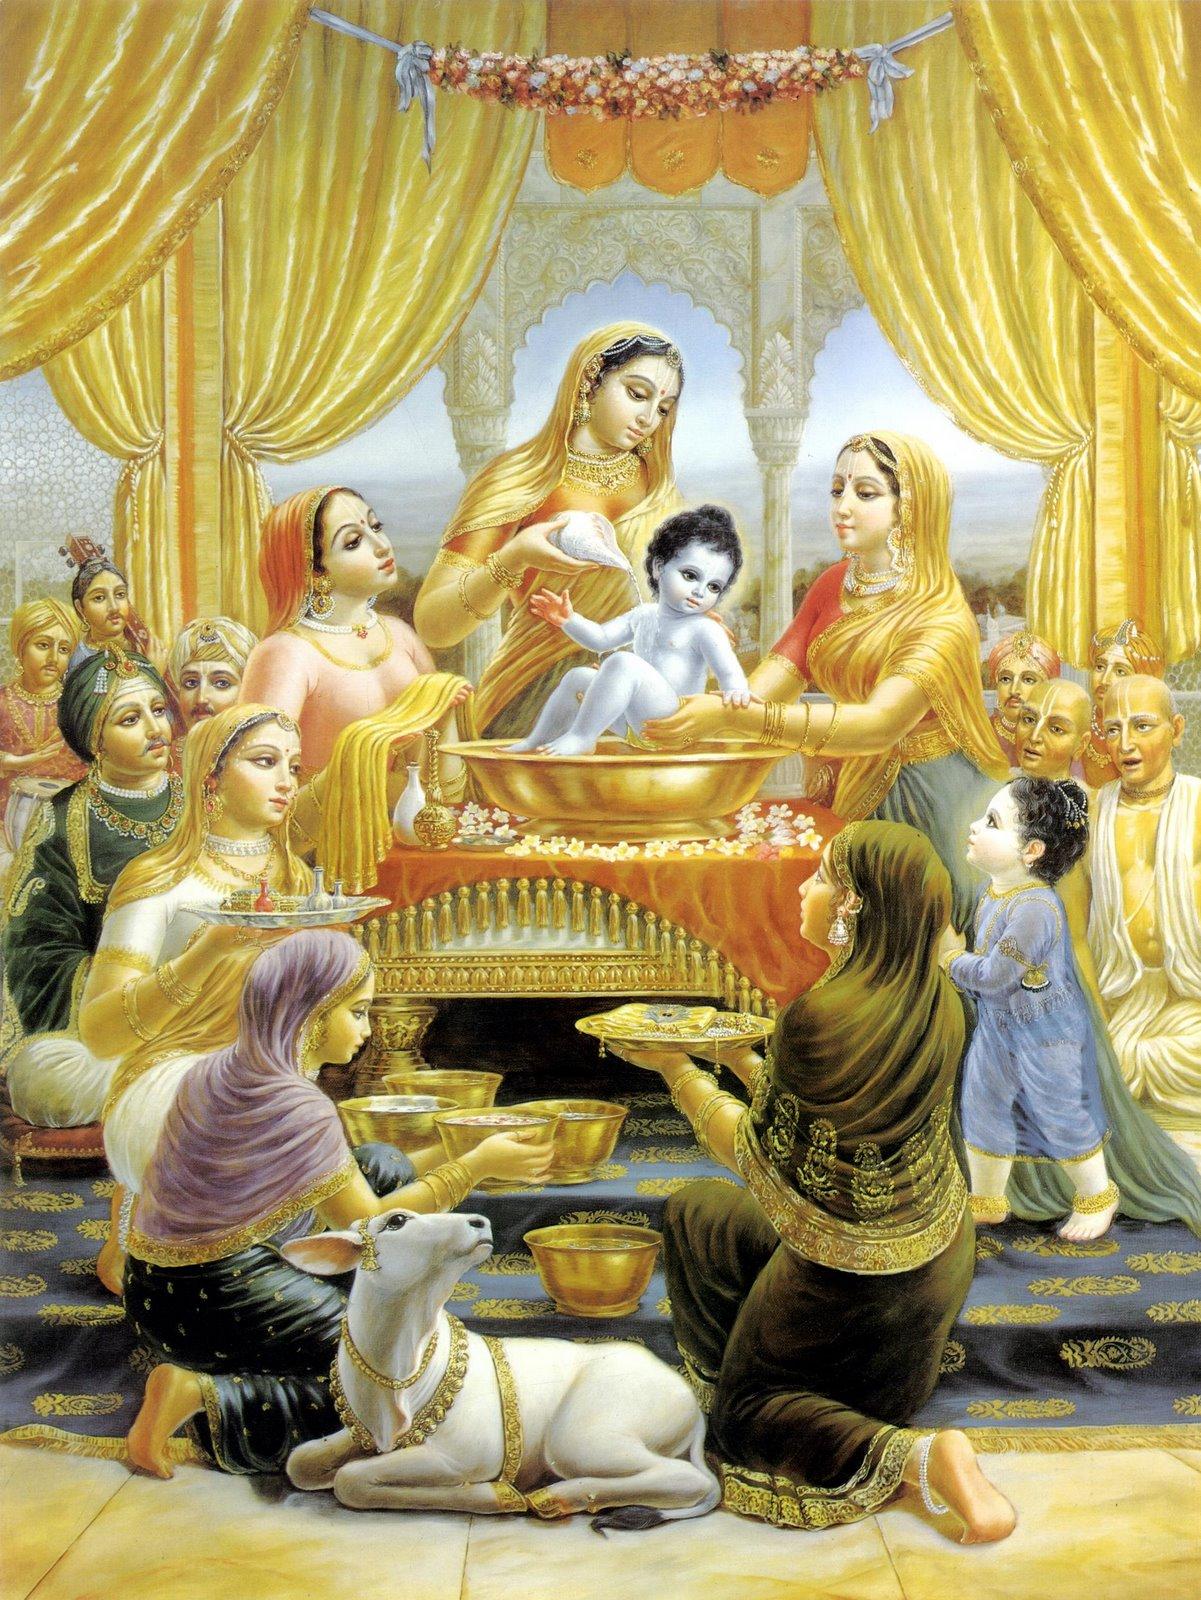 Baby Krishna's bathing and naming ceremony.